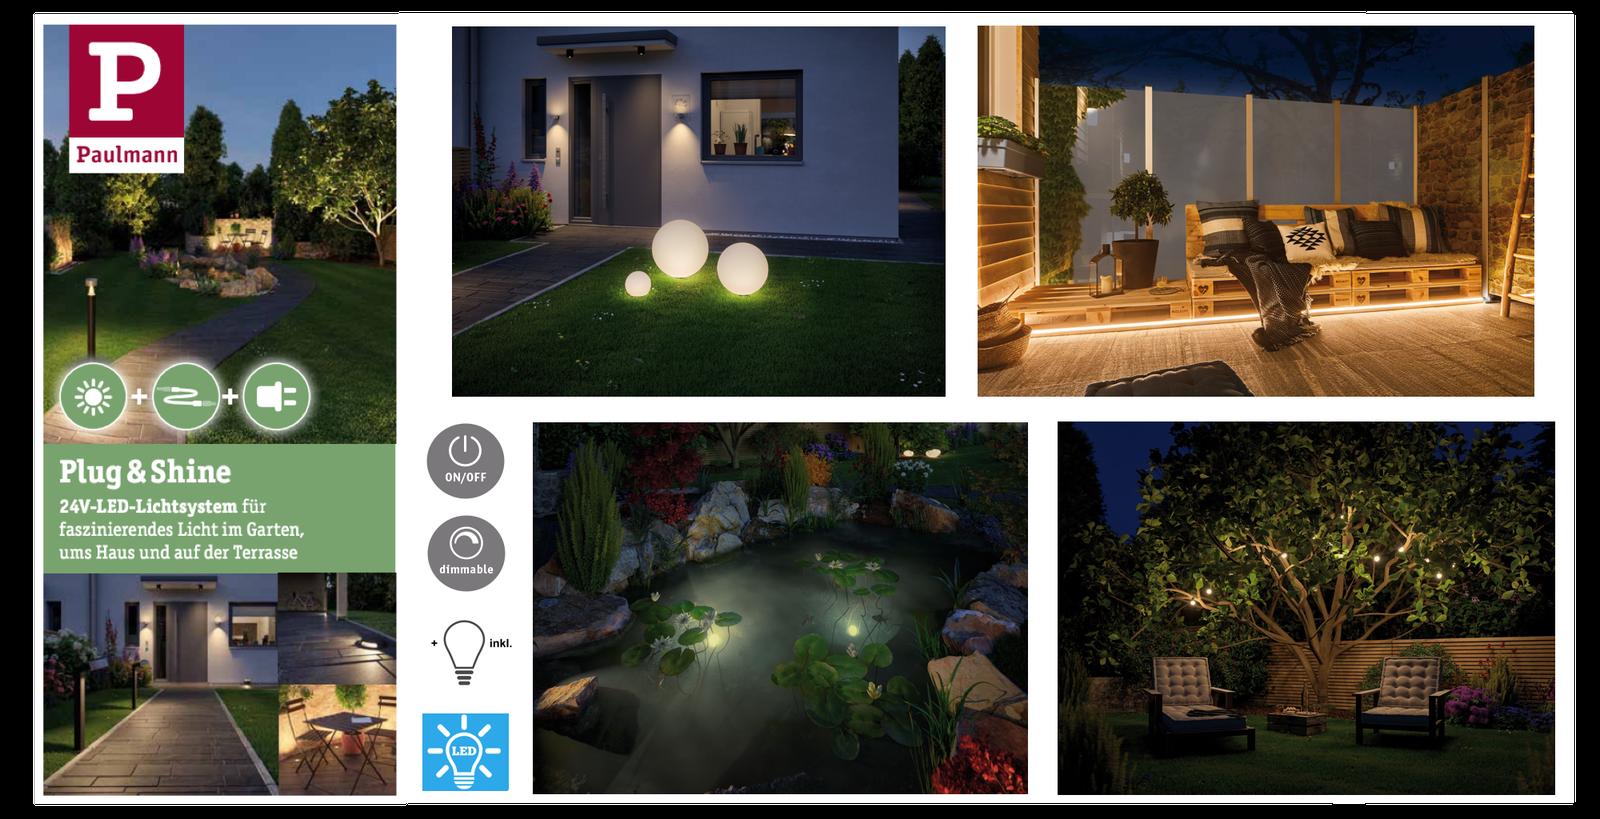 Paulmann Plug & Shine Garten Beleuchtungssortiment 24V Lichtsystem Plug&Shine